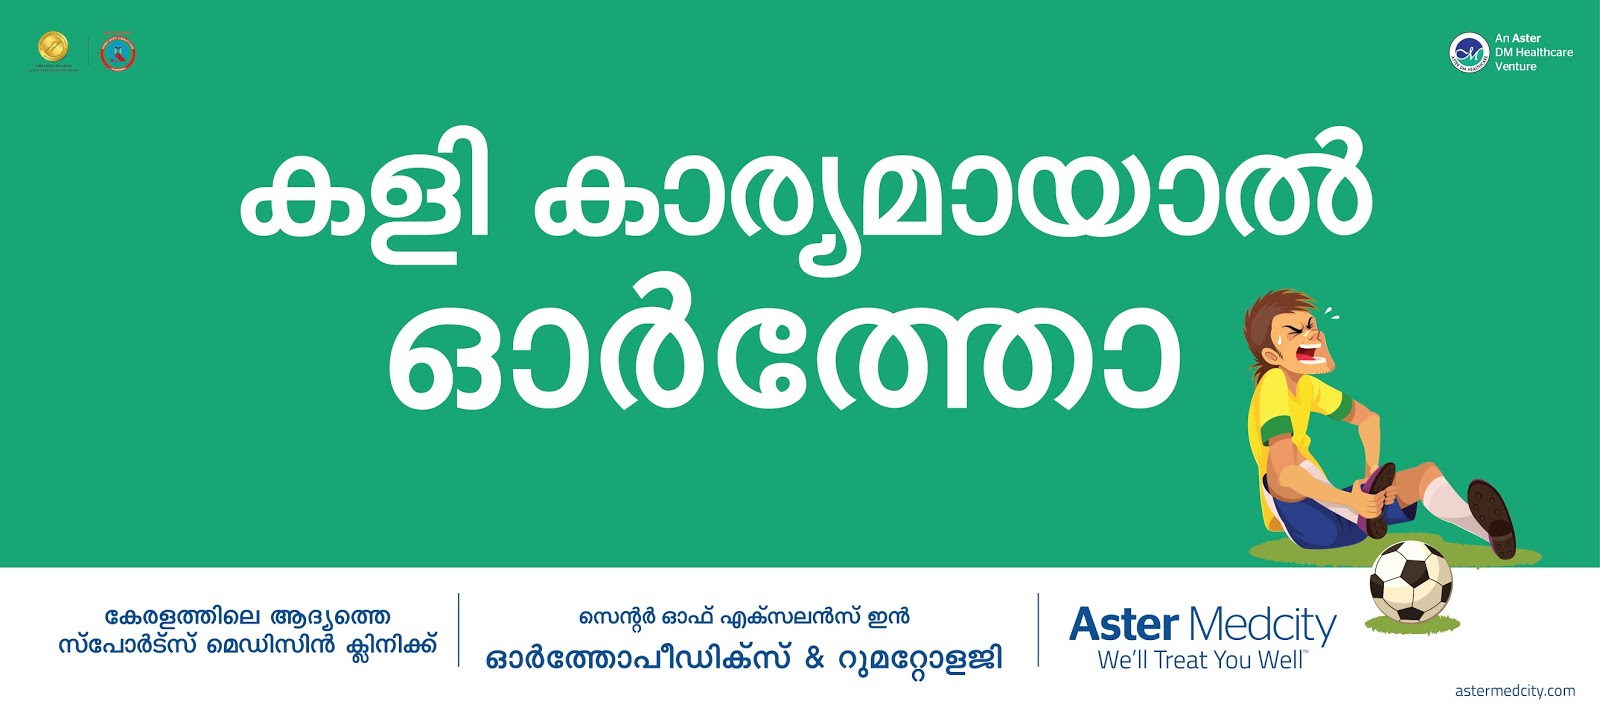 Aster Medcity - 24x7 Ortho Surgery | Print mock-up 4 | Stark Communications Pvt Ltd